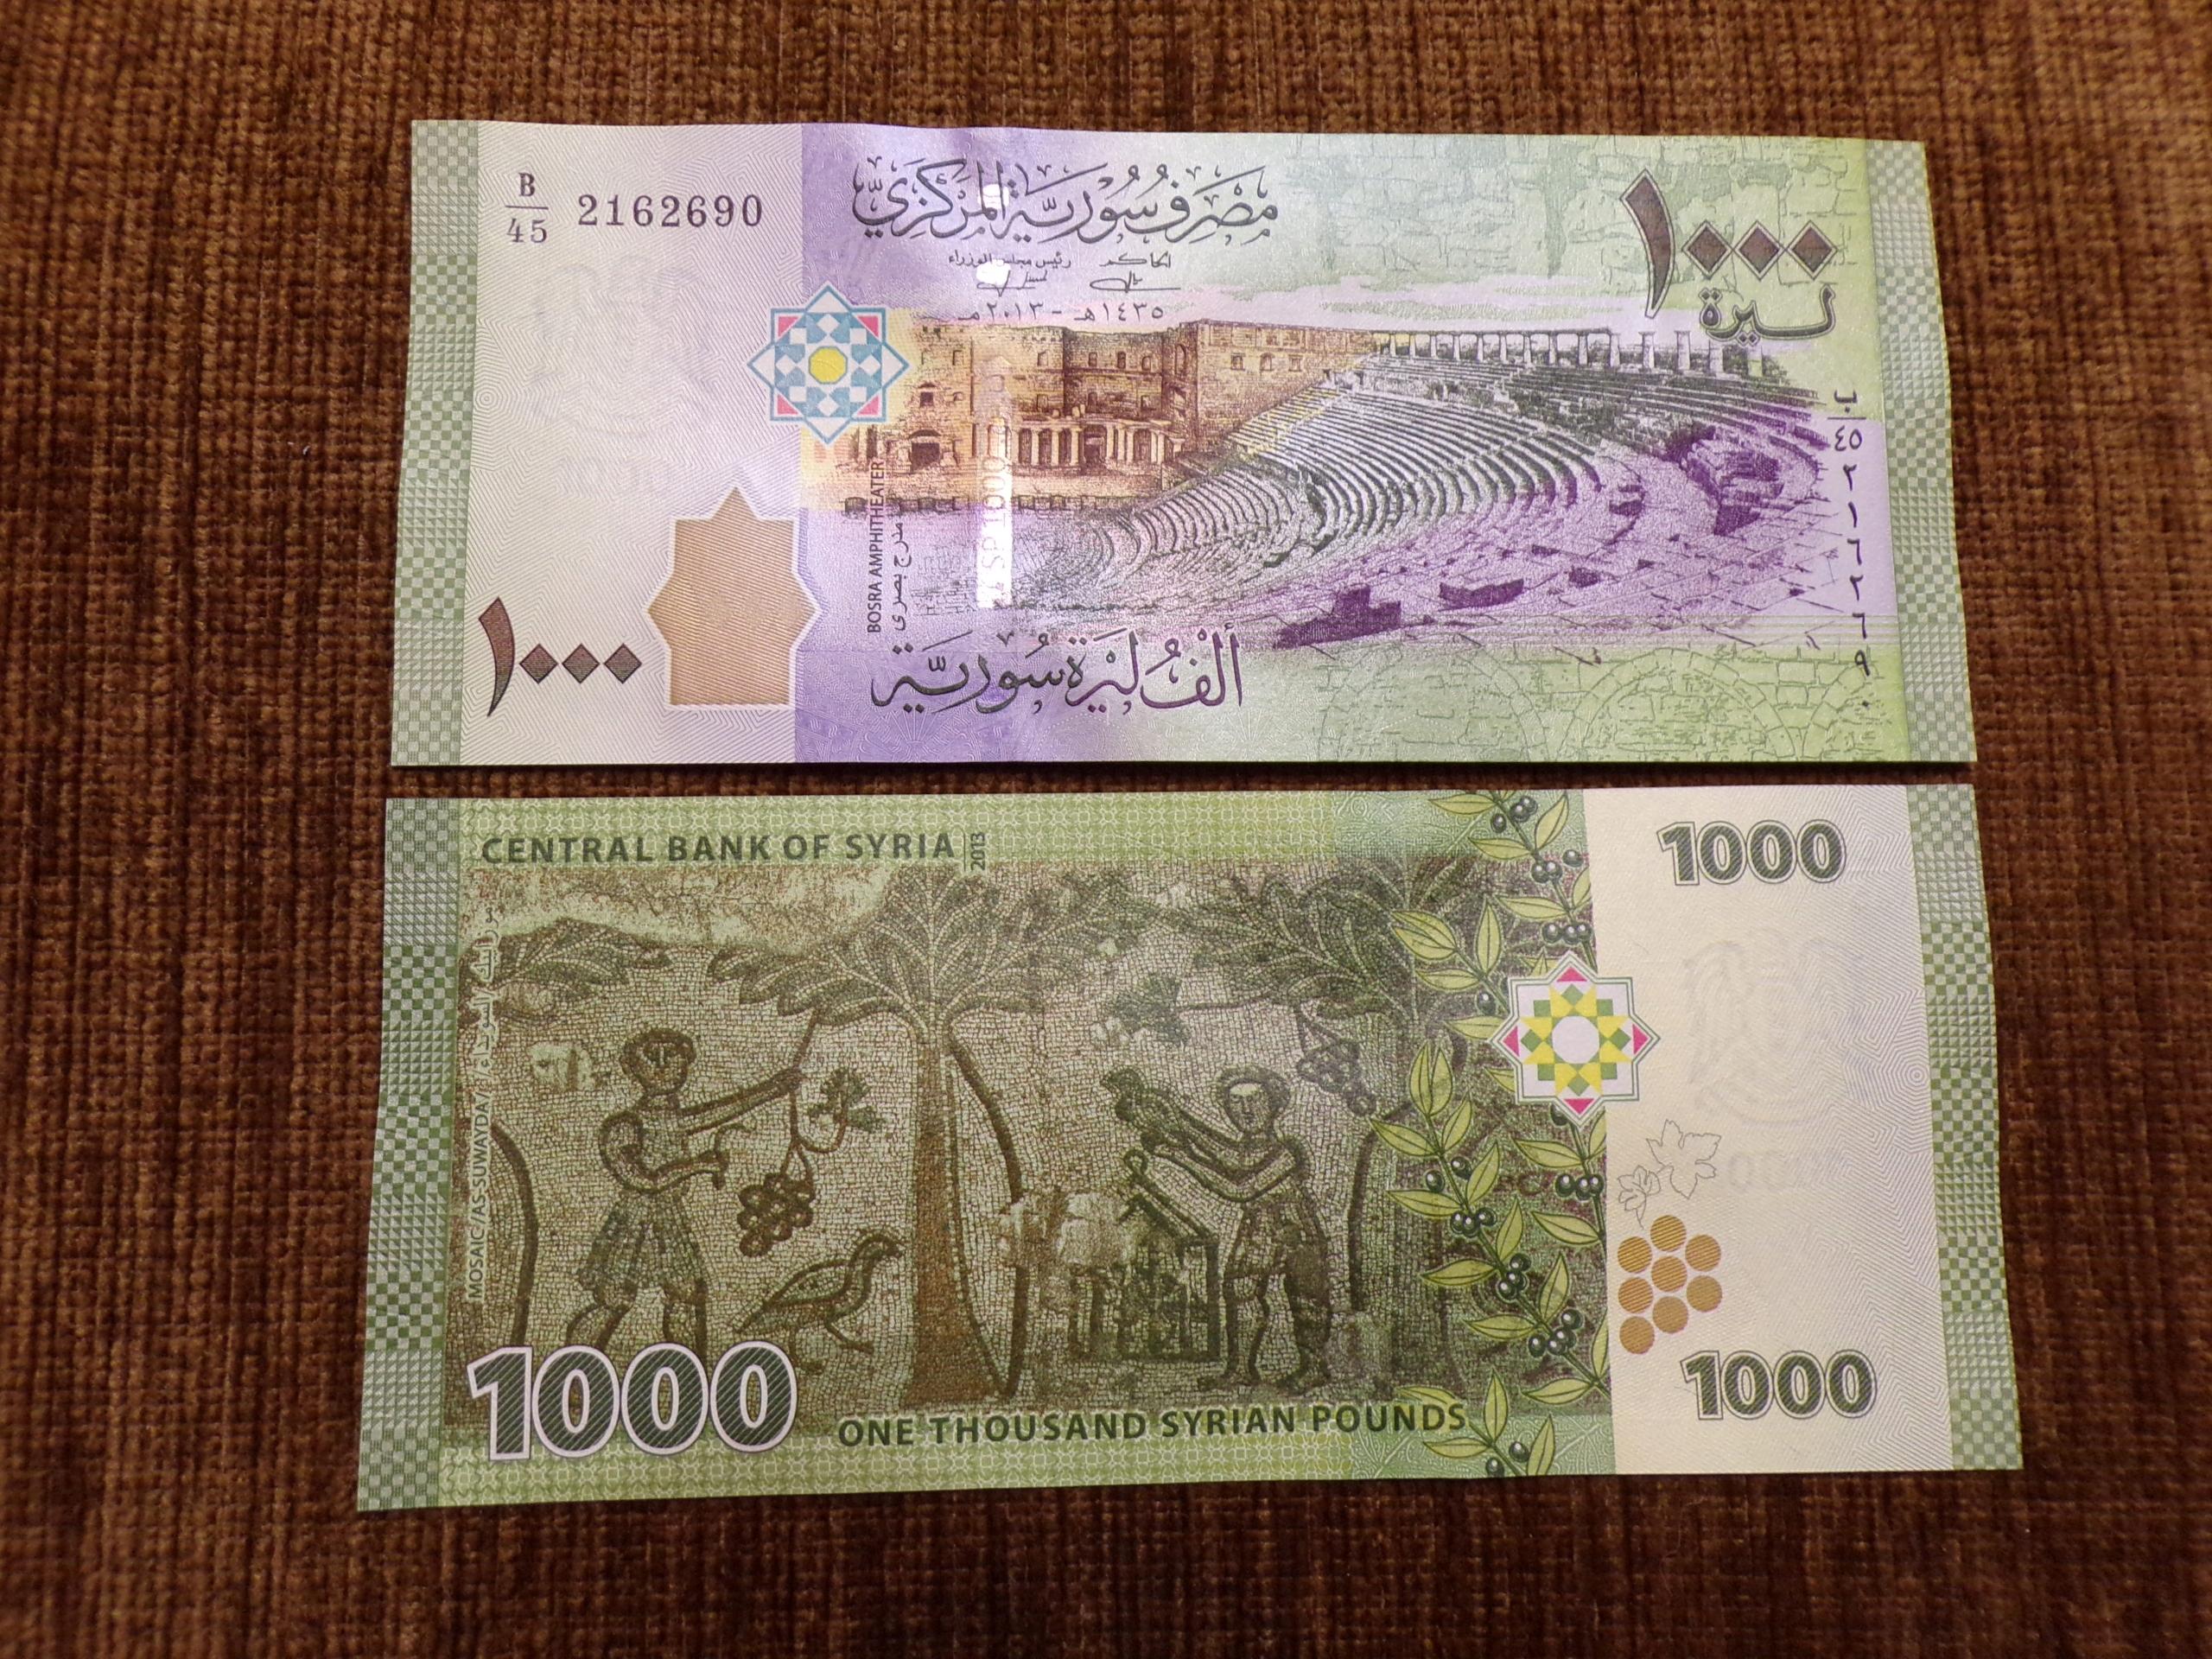 207.SYRIA 1000 фунтов UNC